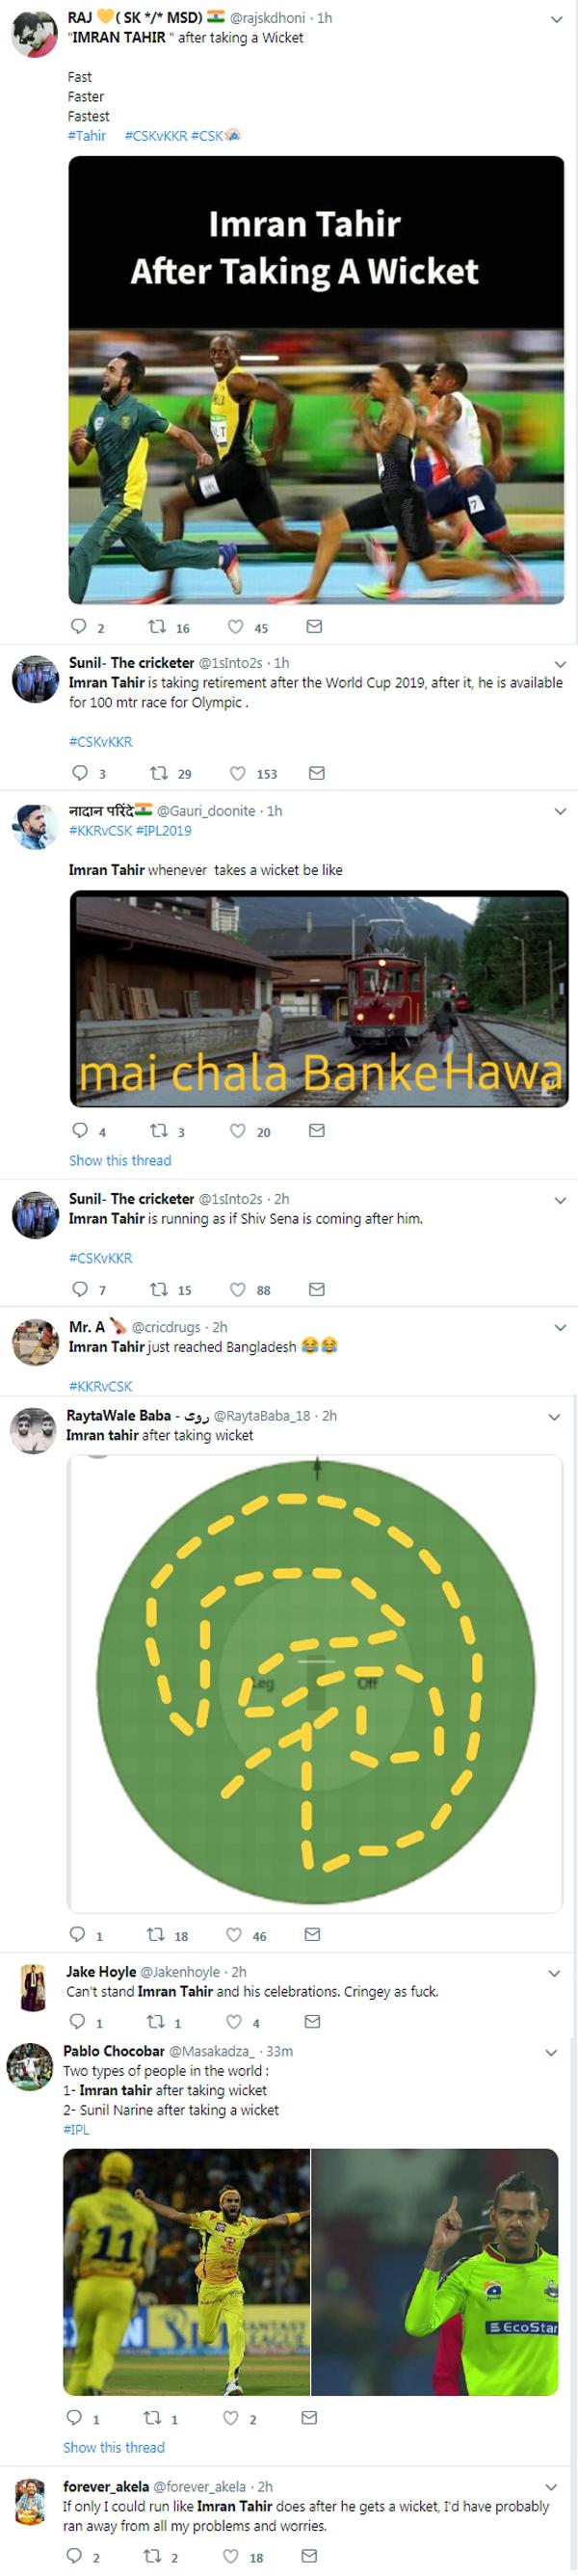 IPL 2019 : Imrah Tahir make big records in KKR v CSK match